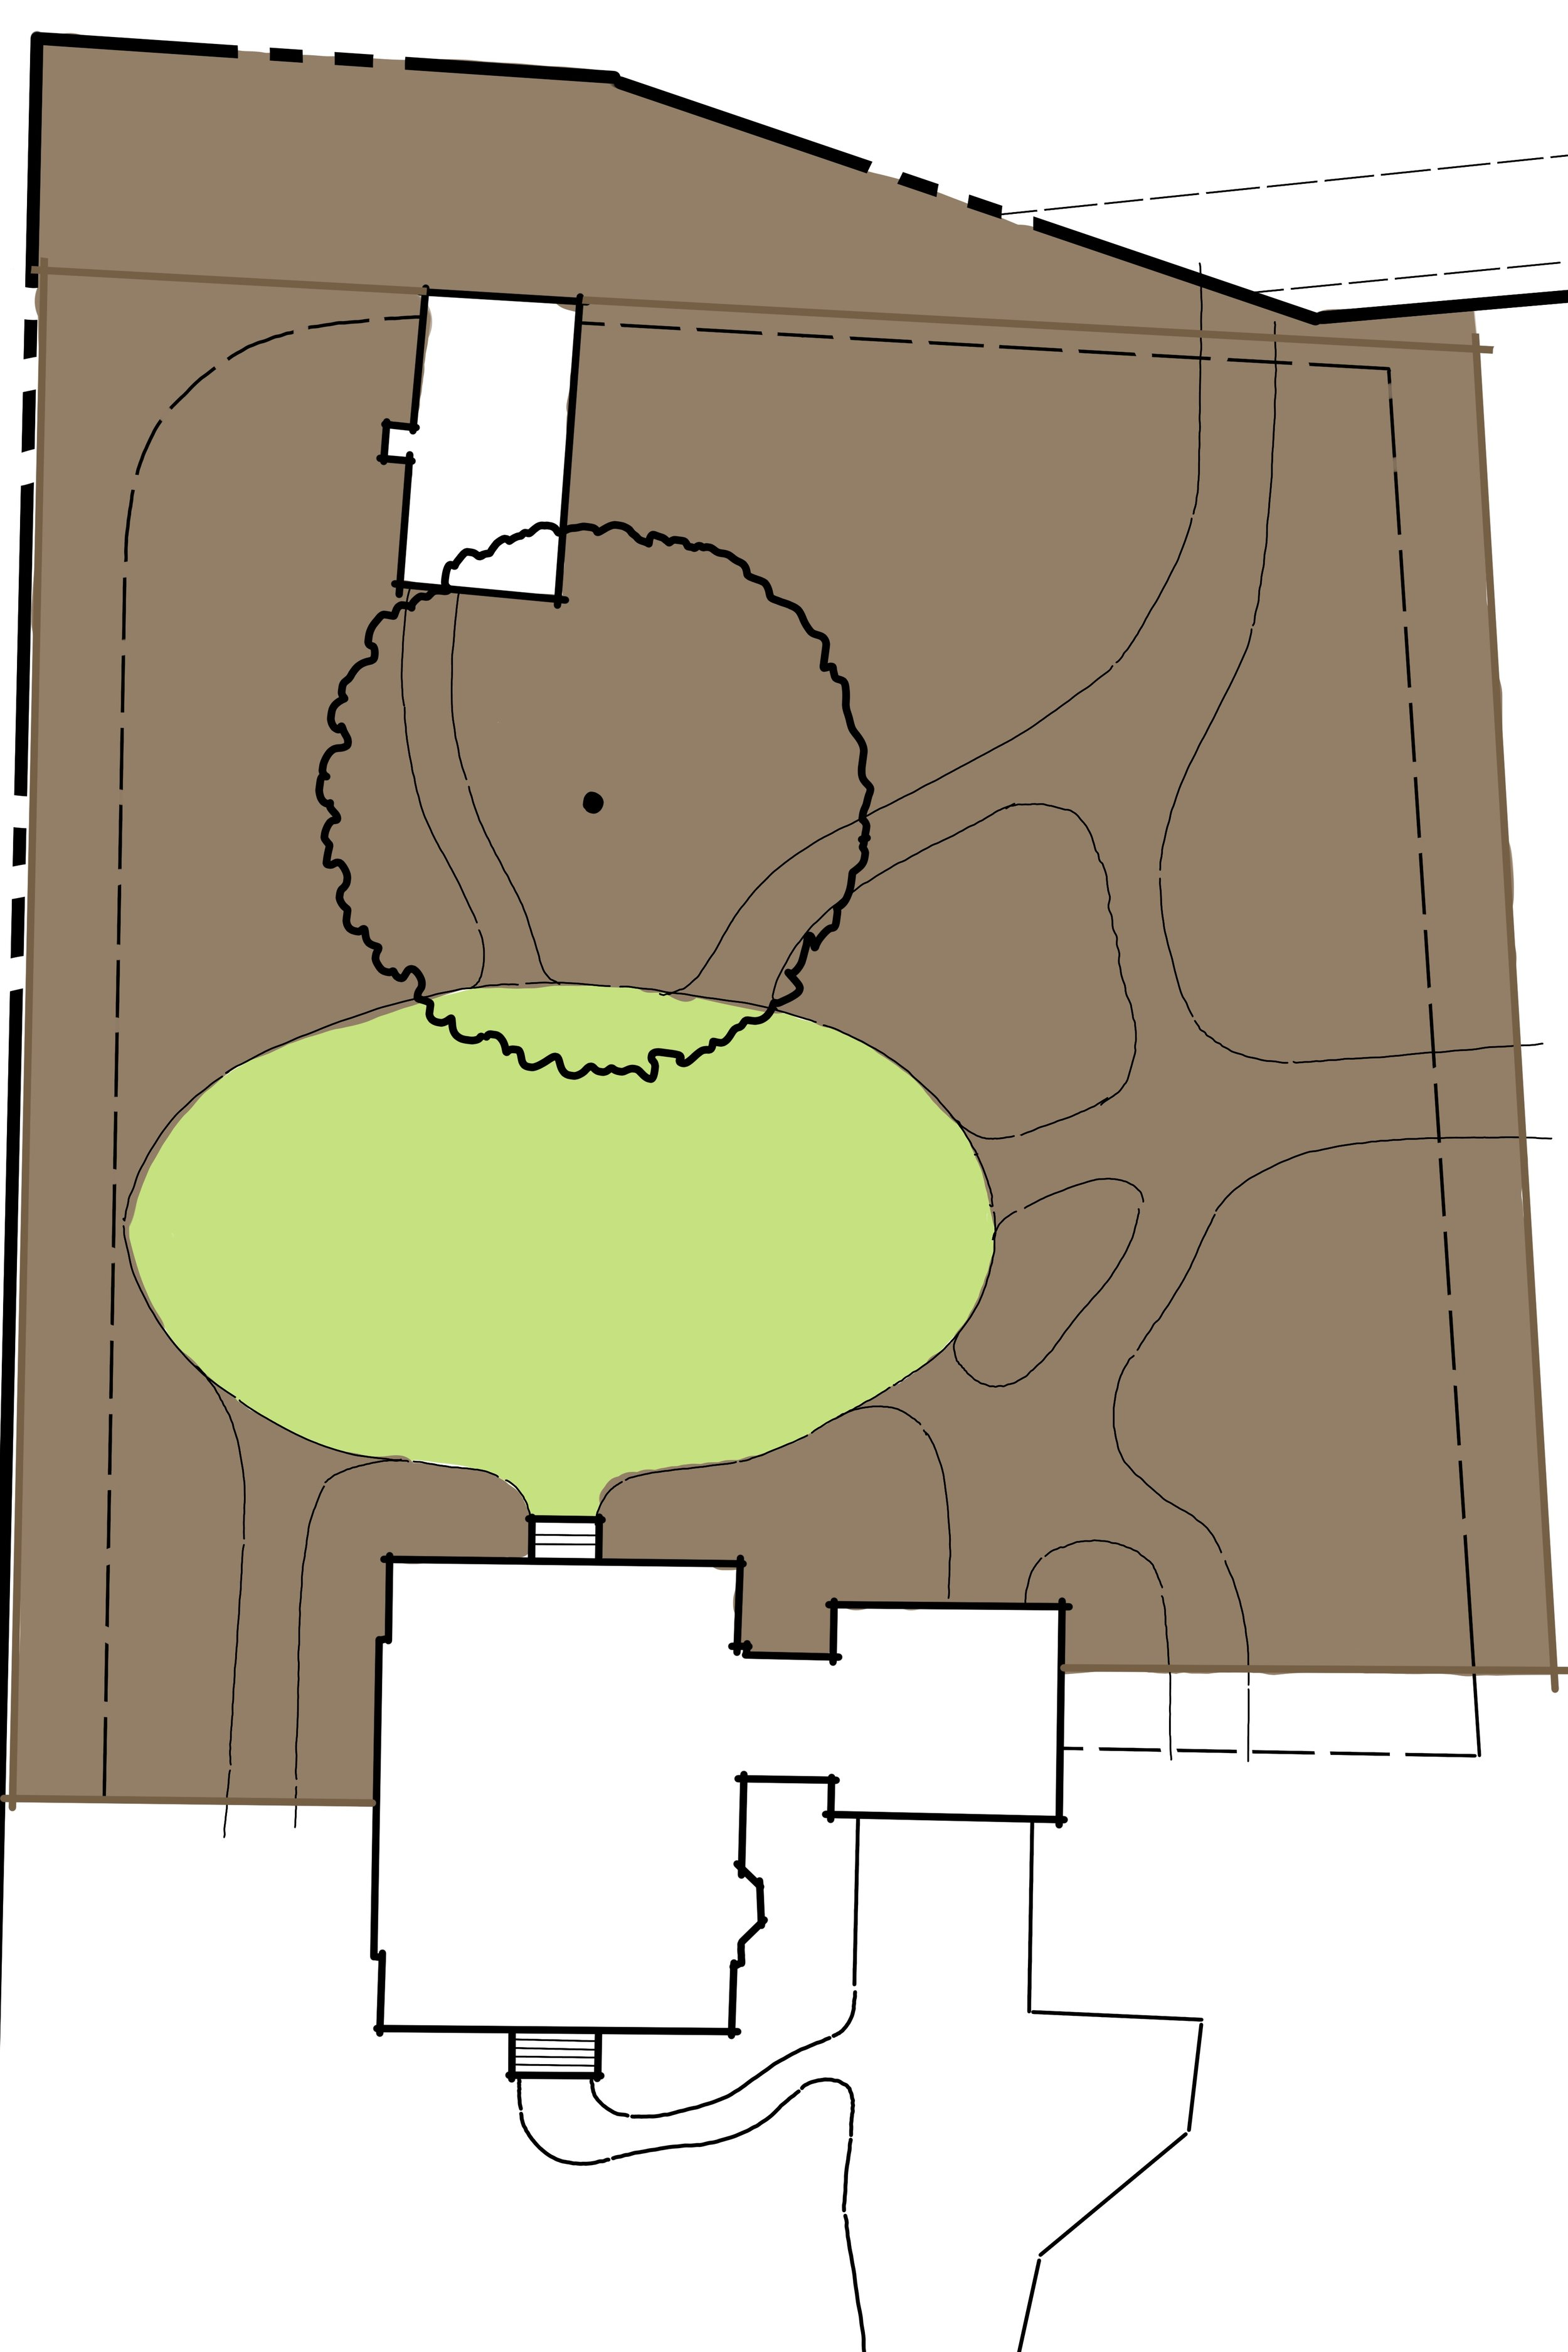 Schoonmaker_Concept_Plants.mulchlawn.jpg